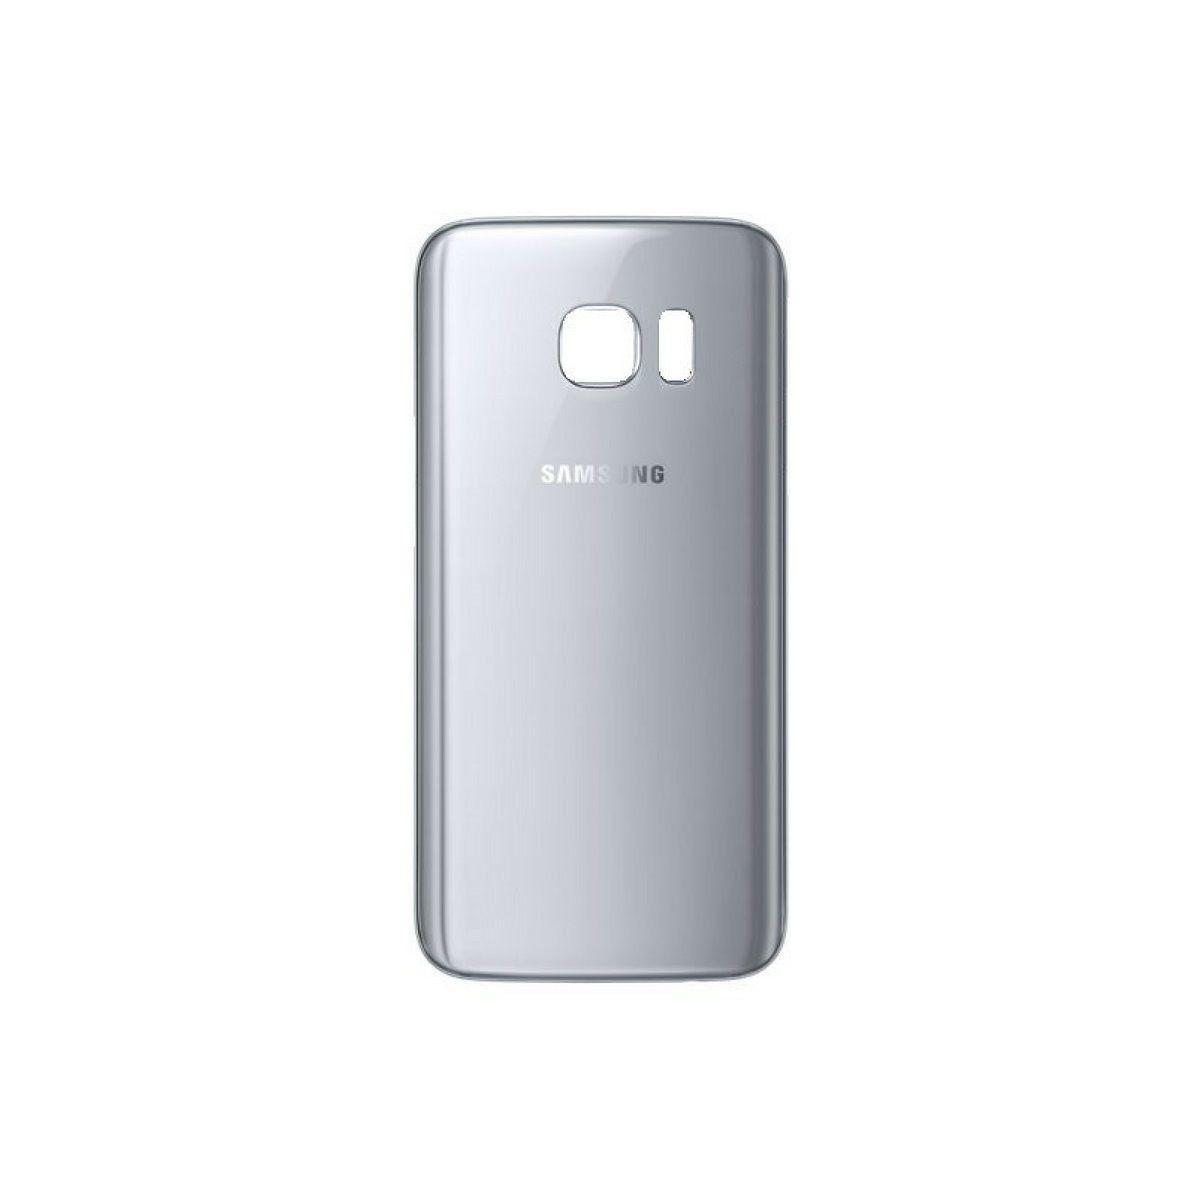 Tampa Traseira Vidro Samsung Galaxy S7 Sm-g930 G930f G930fd BRANCO